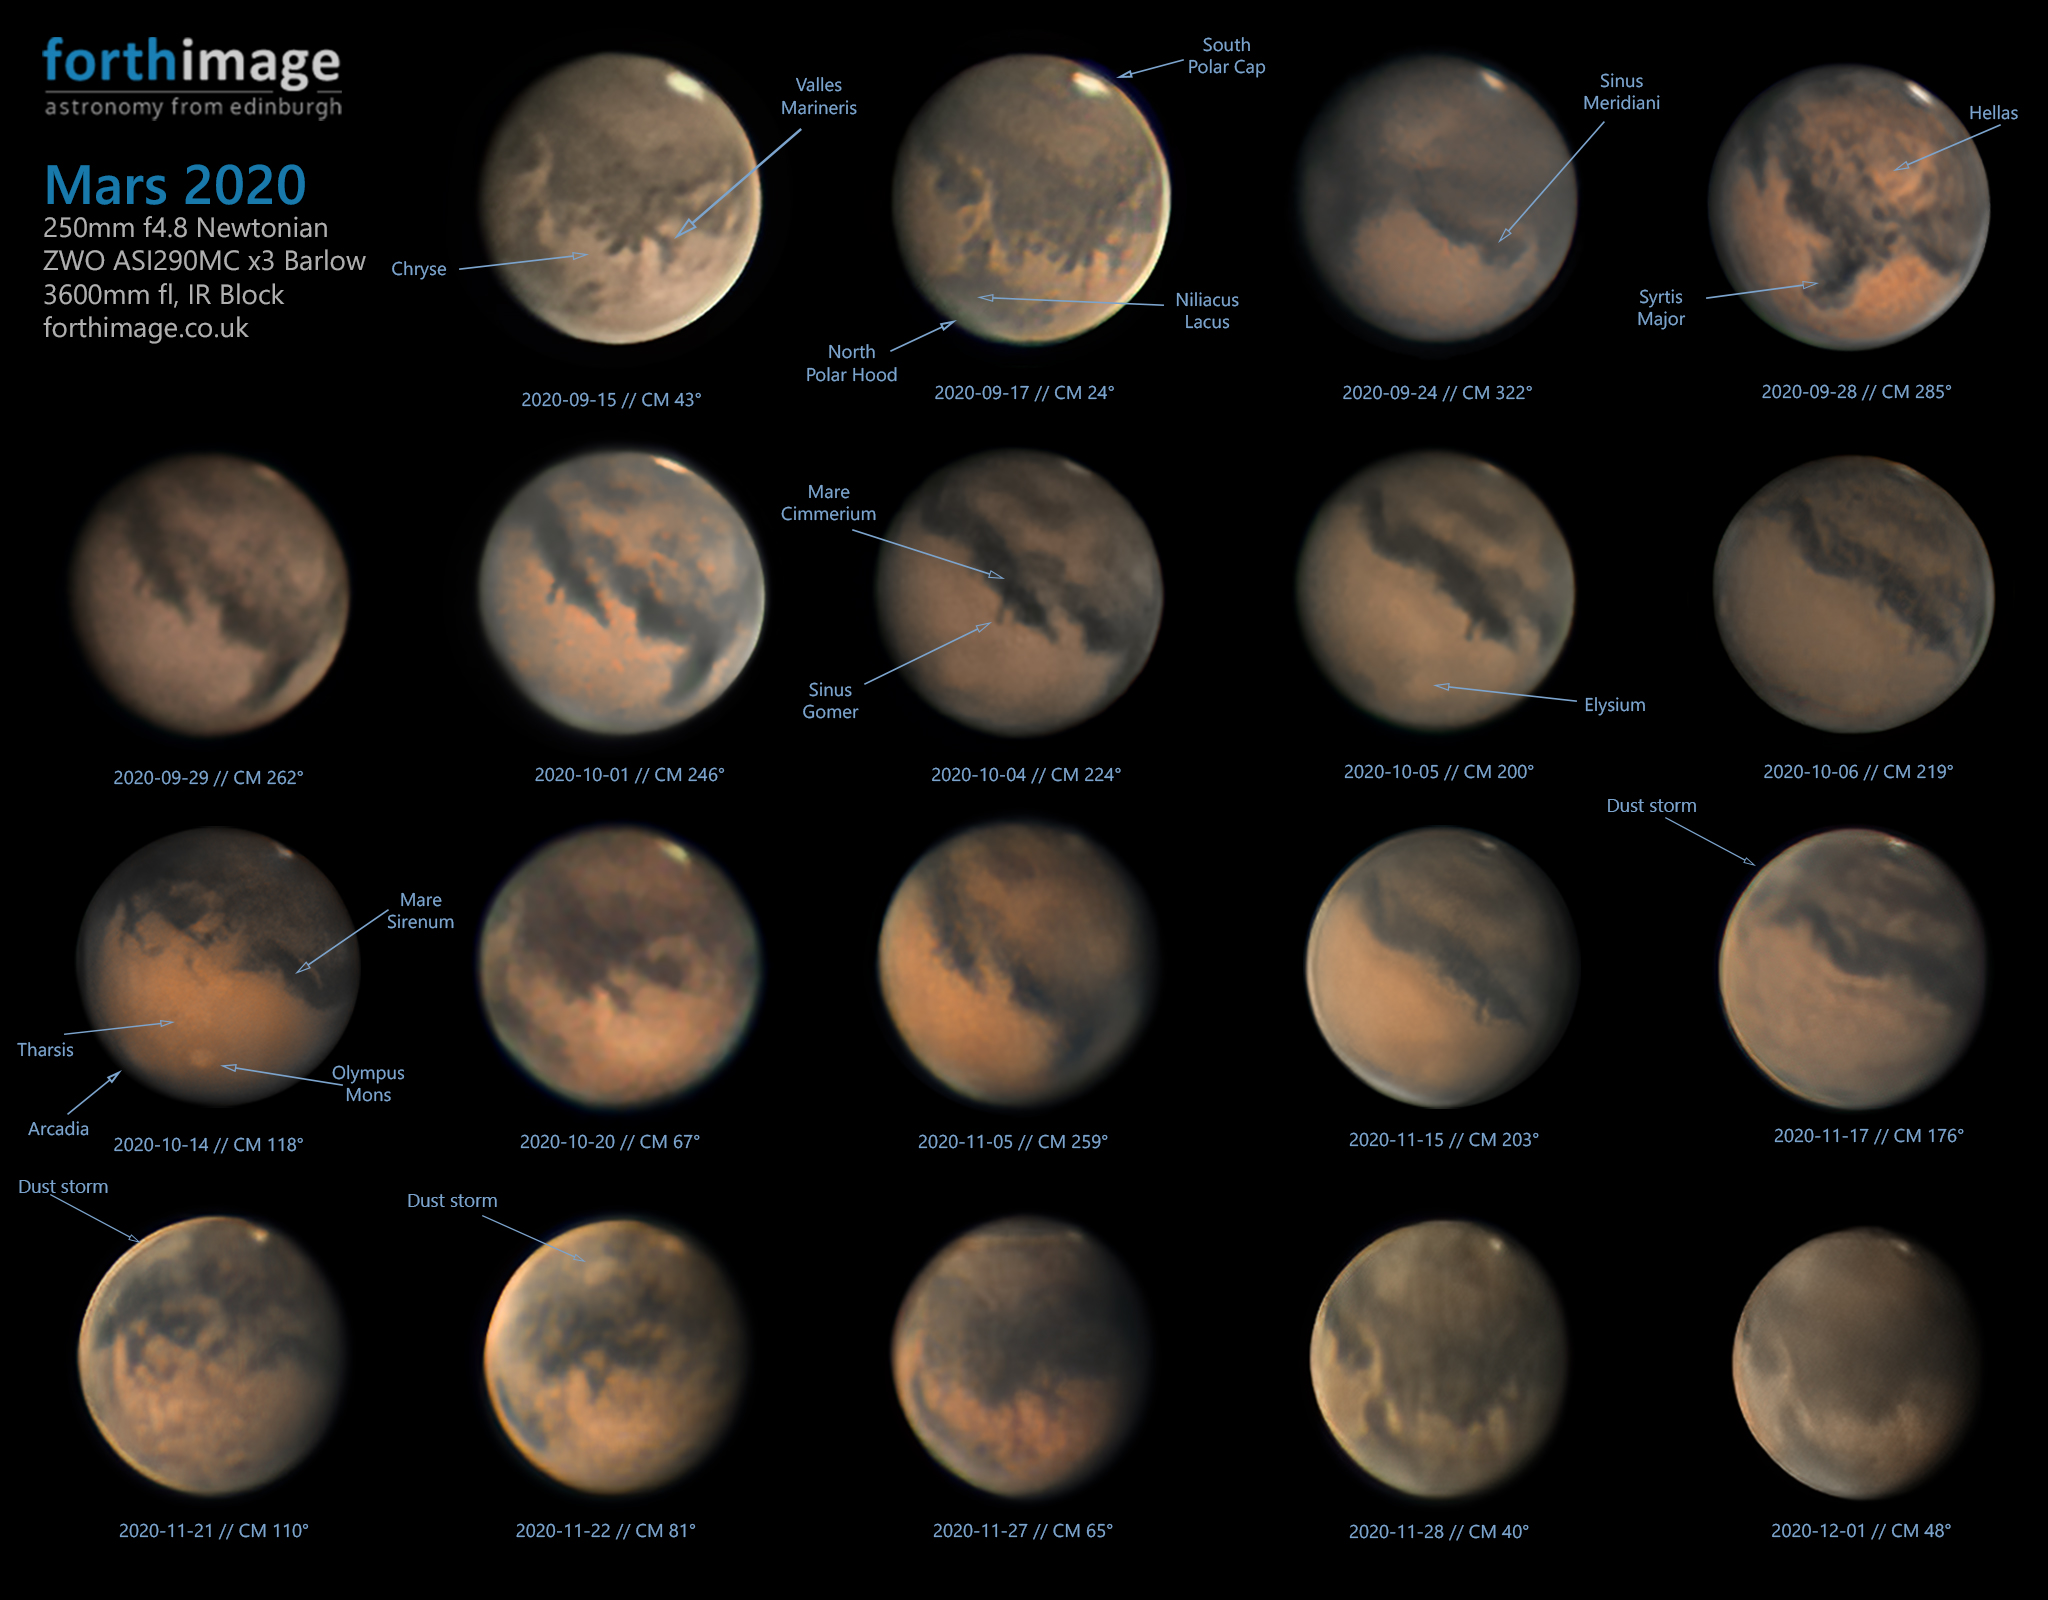 Mars 2020 updated 2020-12-01